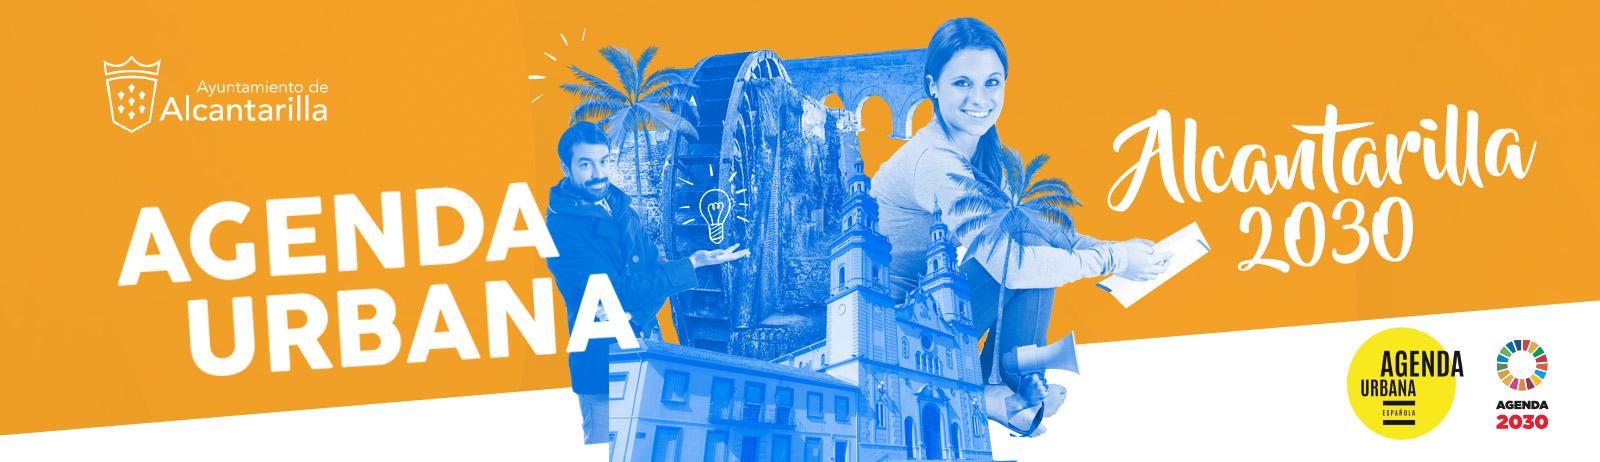 banner-agenda-alcantarilla